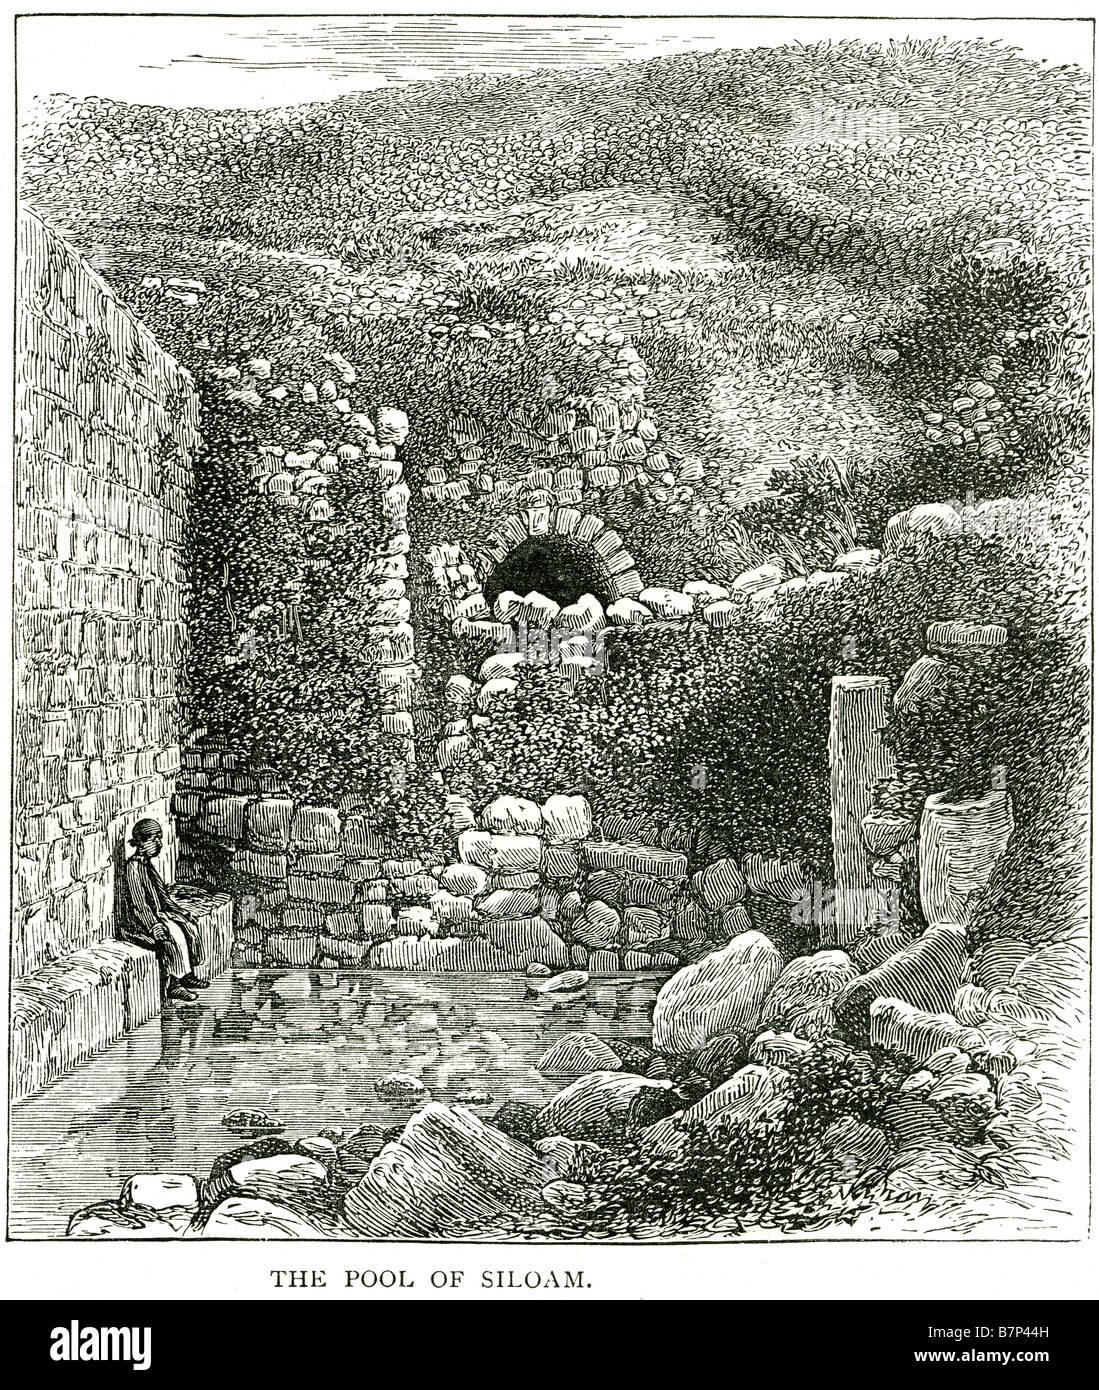 pool siloam Hebrew Breikhat Hashiloah City of David water tunnel cave sitting boy stone hill - Stock Image